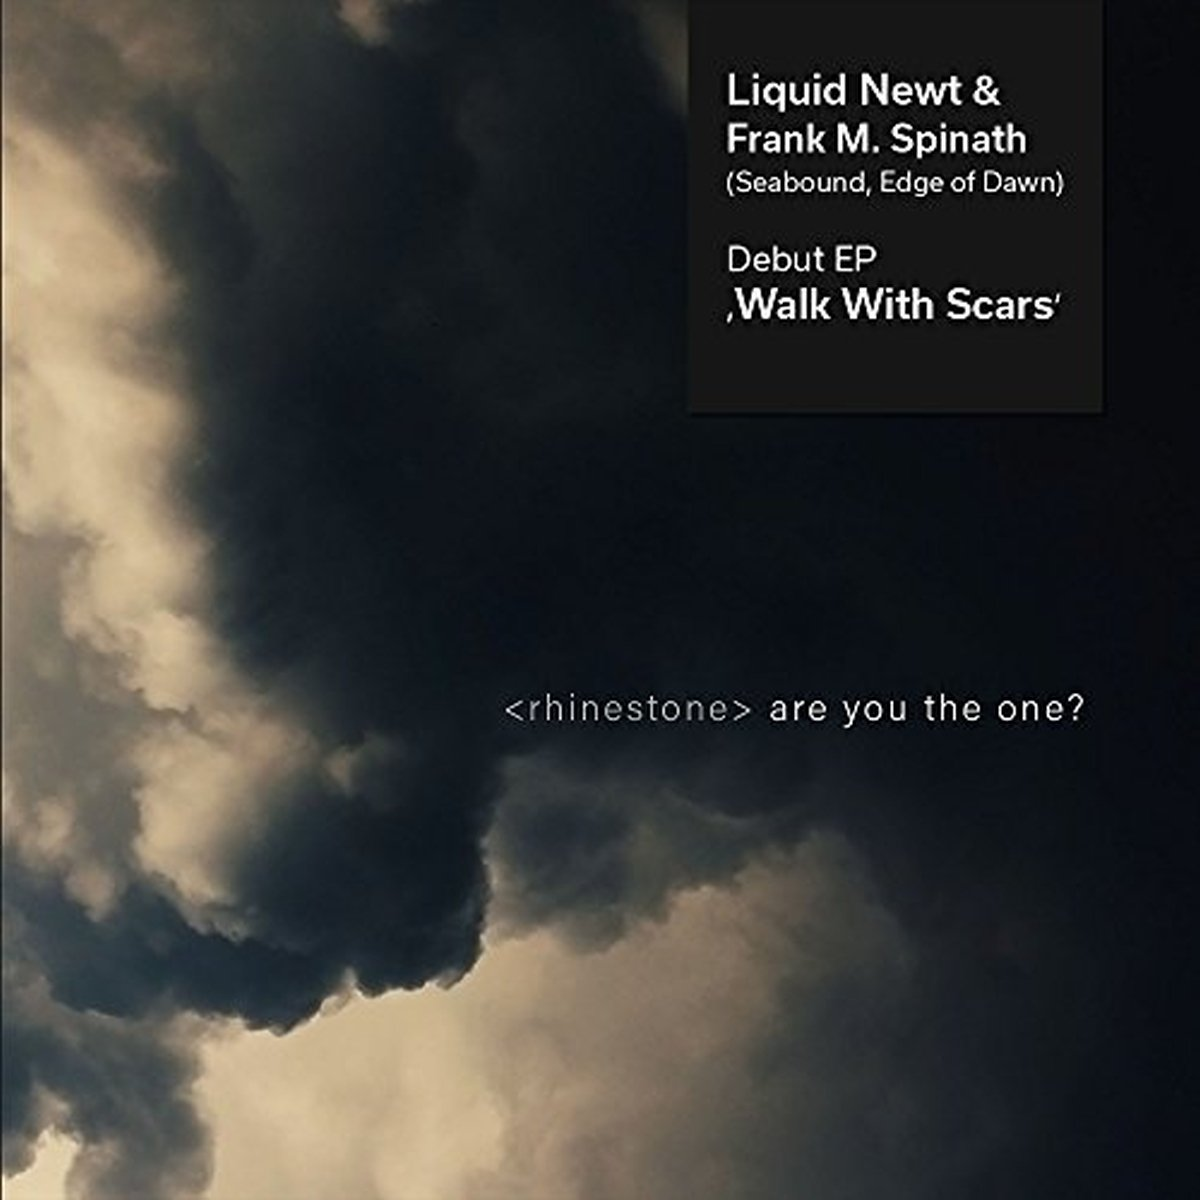 Liquid newt & frank m. spinath - Walk With Scars